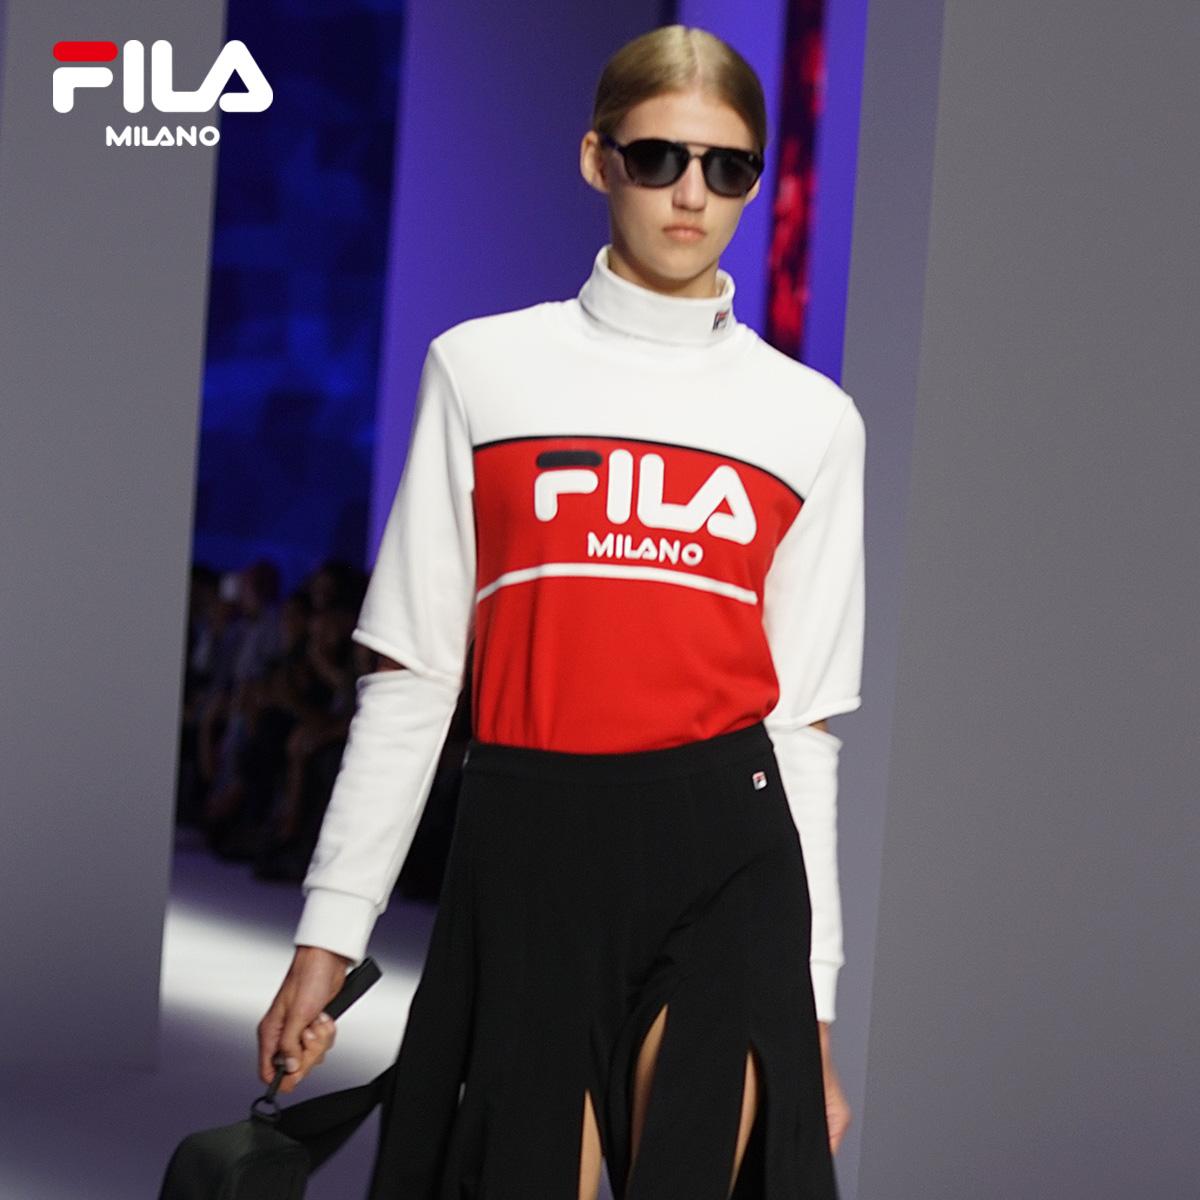 FILA米兰时装周ICONIC系列SNBN限定款 秀场同款 女子针织套头卫衣